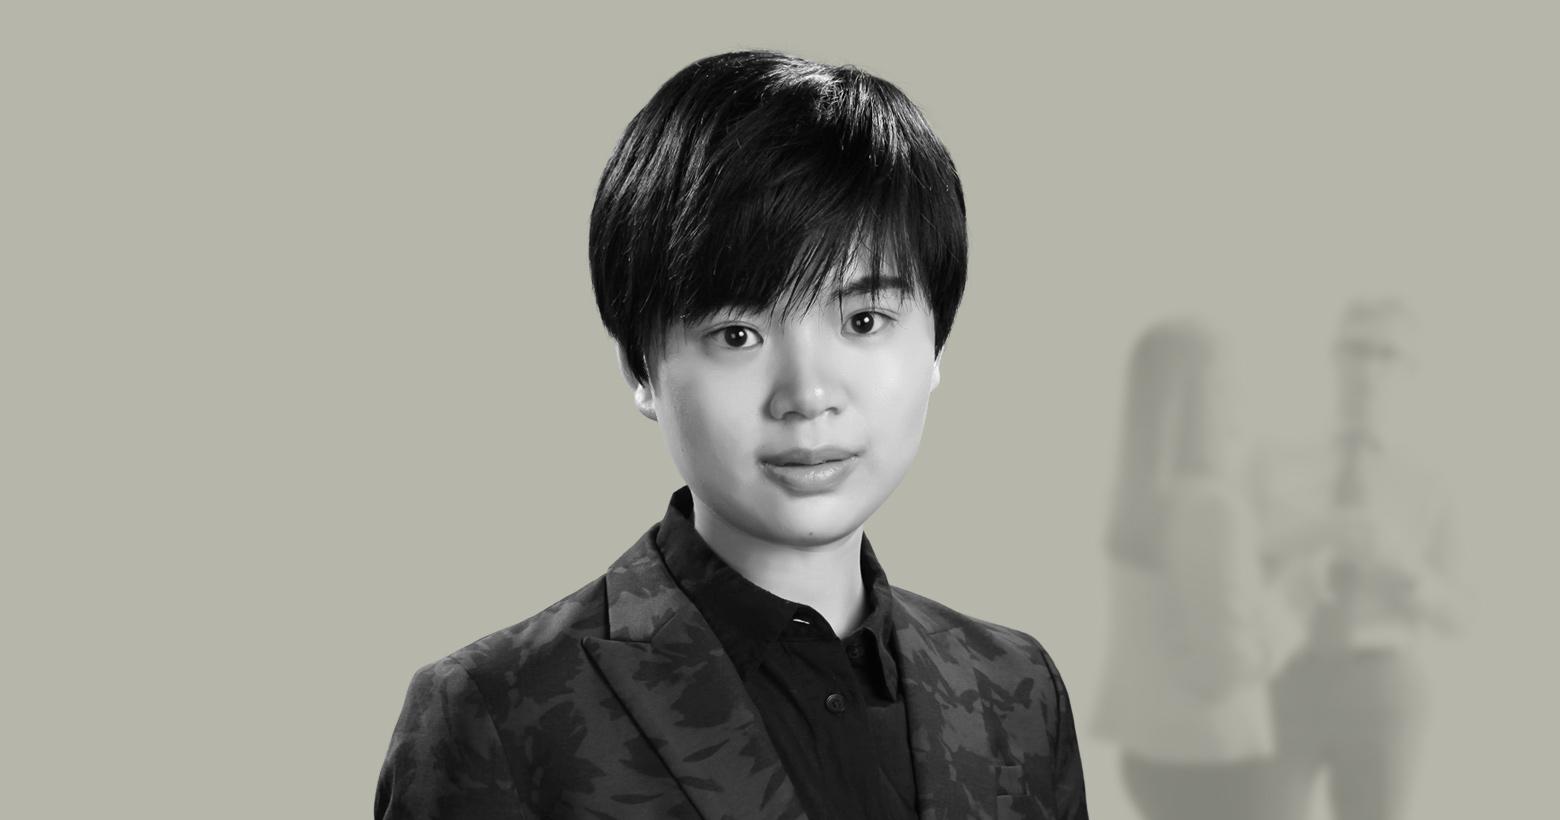 Tianyu Ma